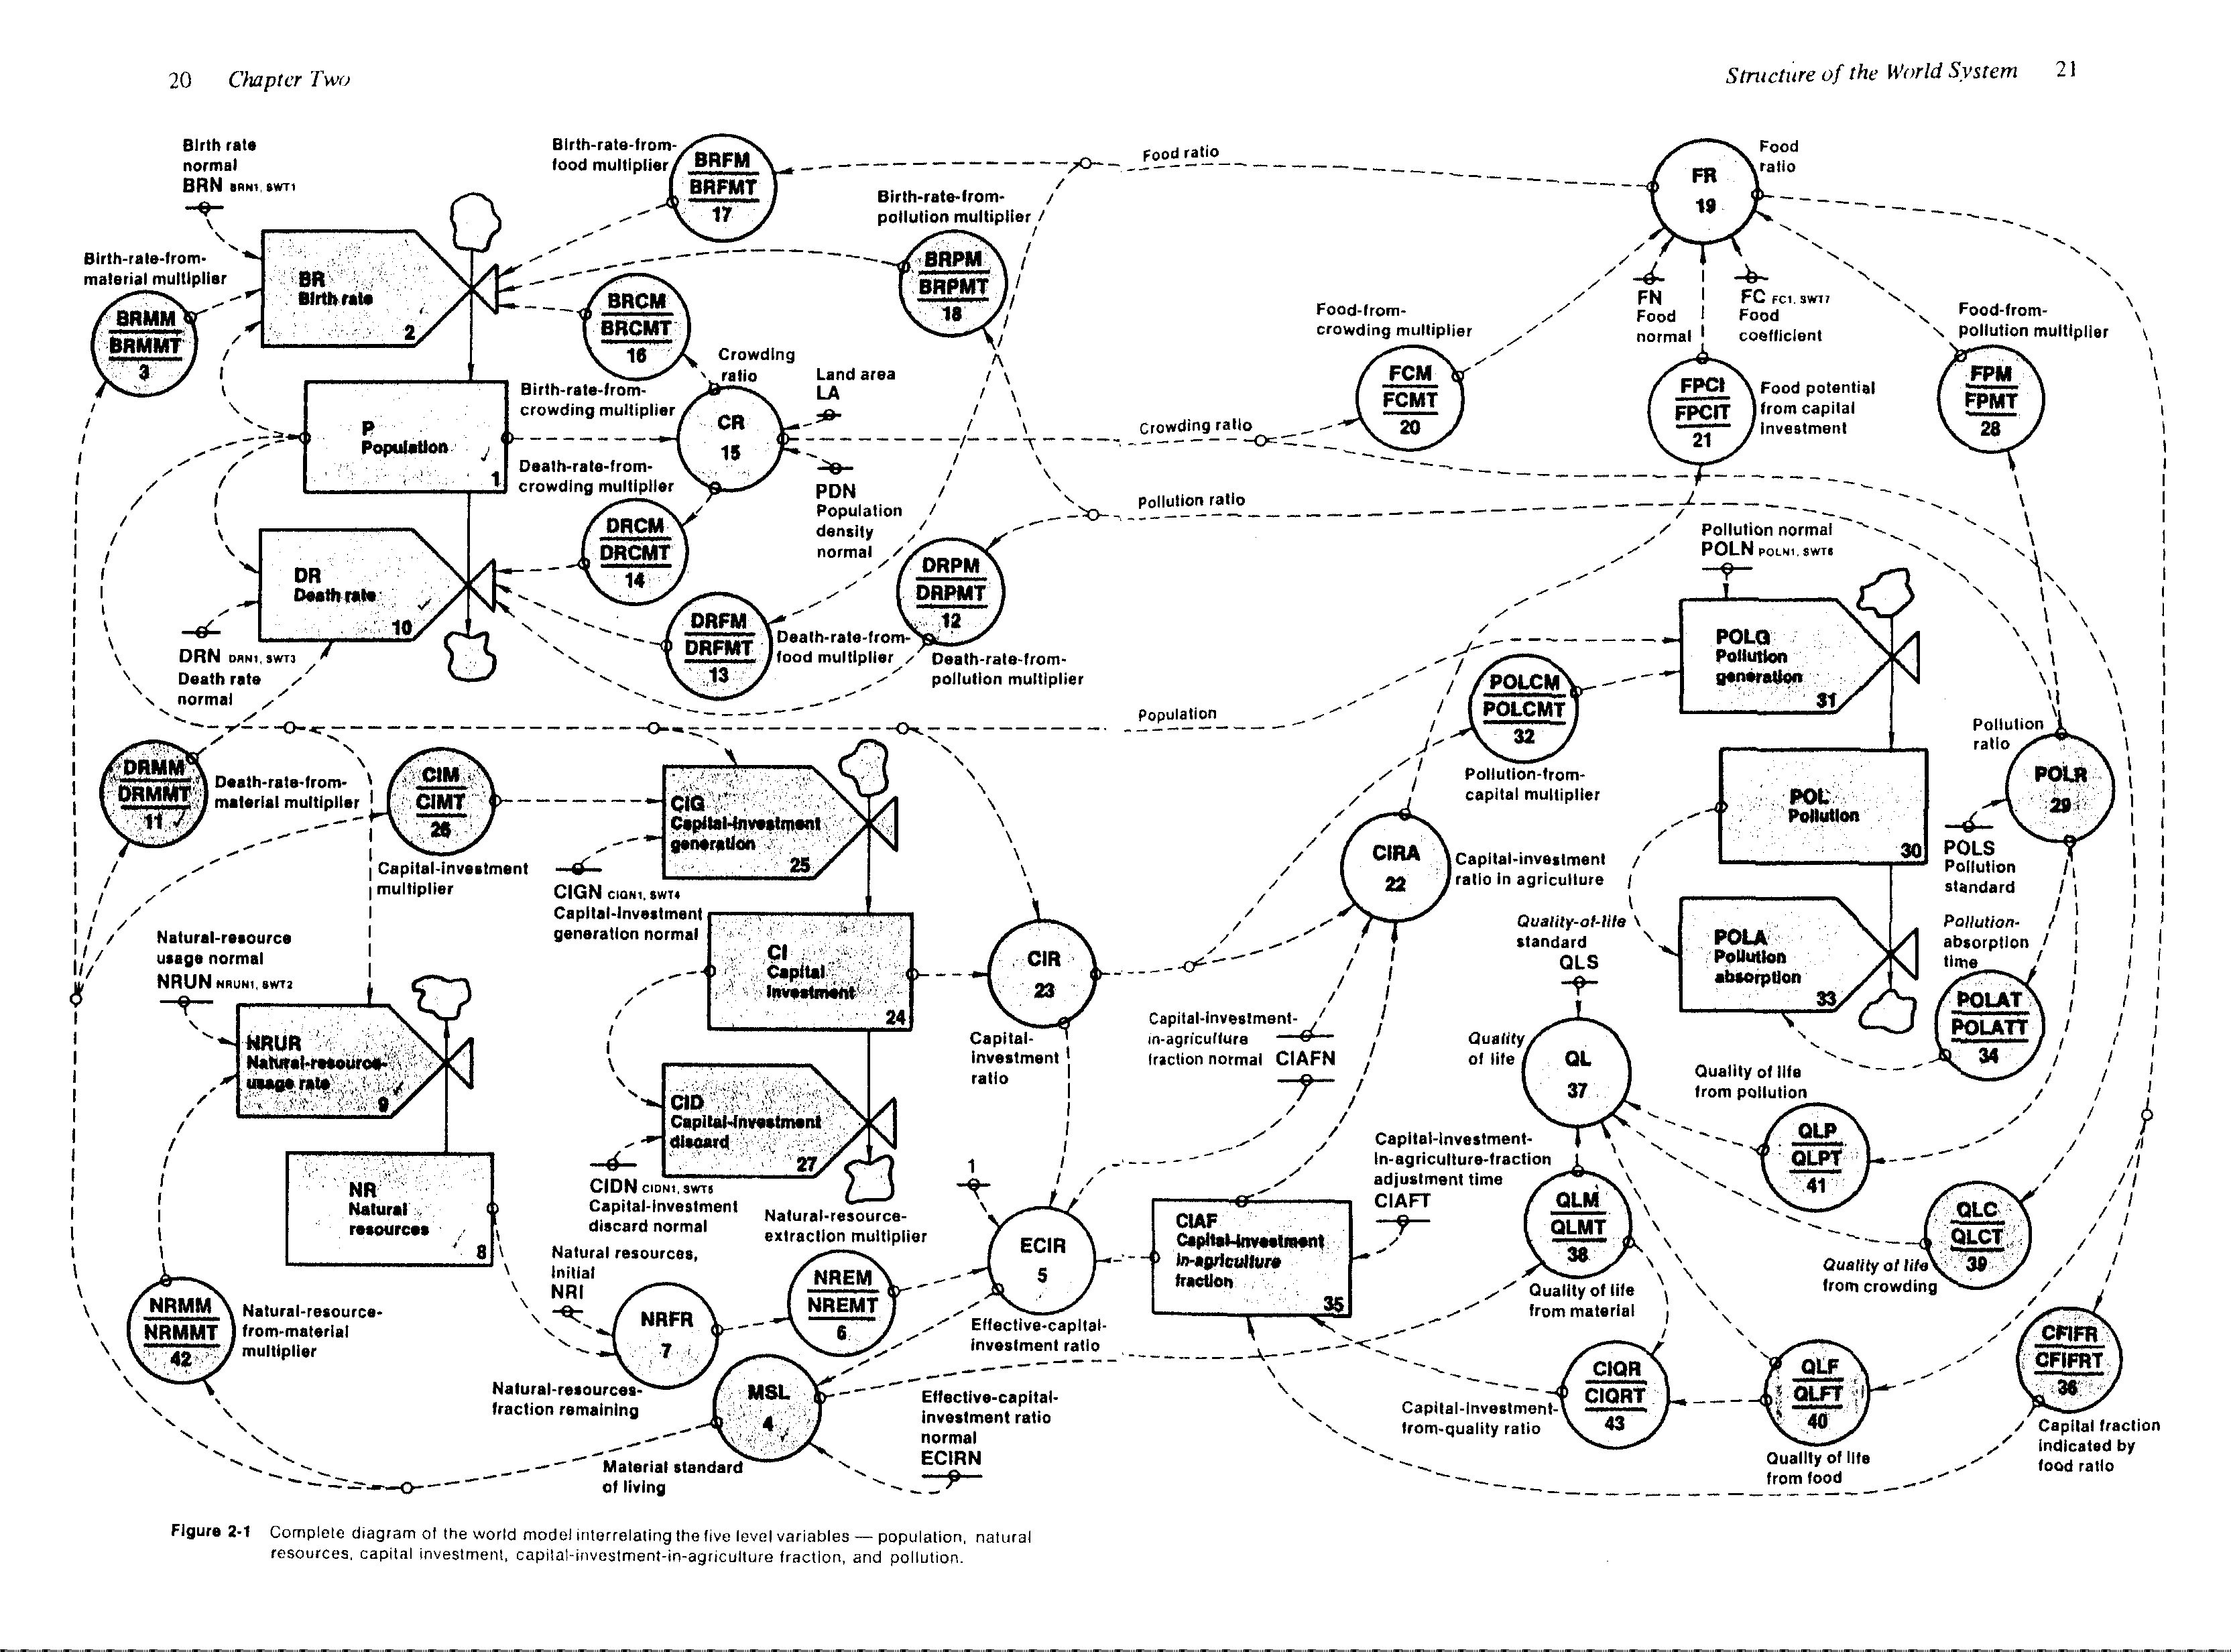 Nervous Net: Jay Forrester's World Dynamics, 1971